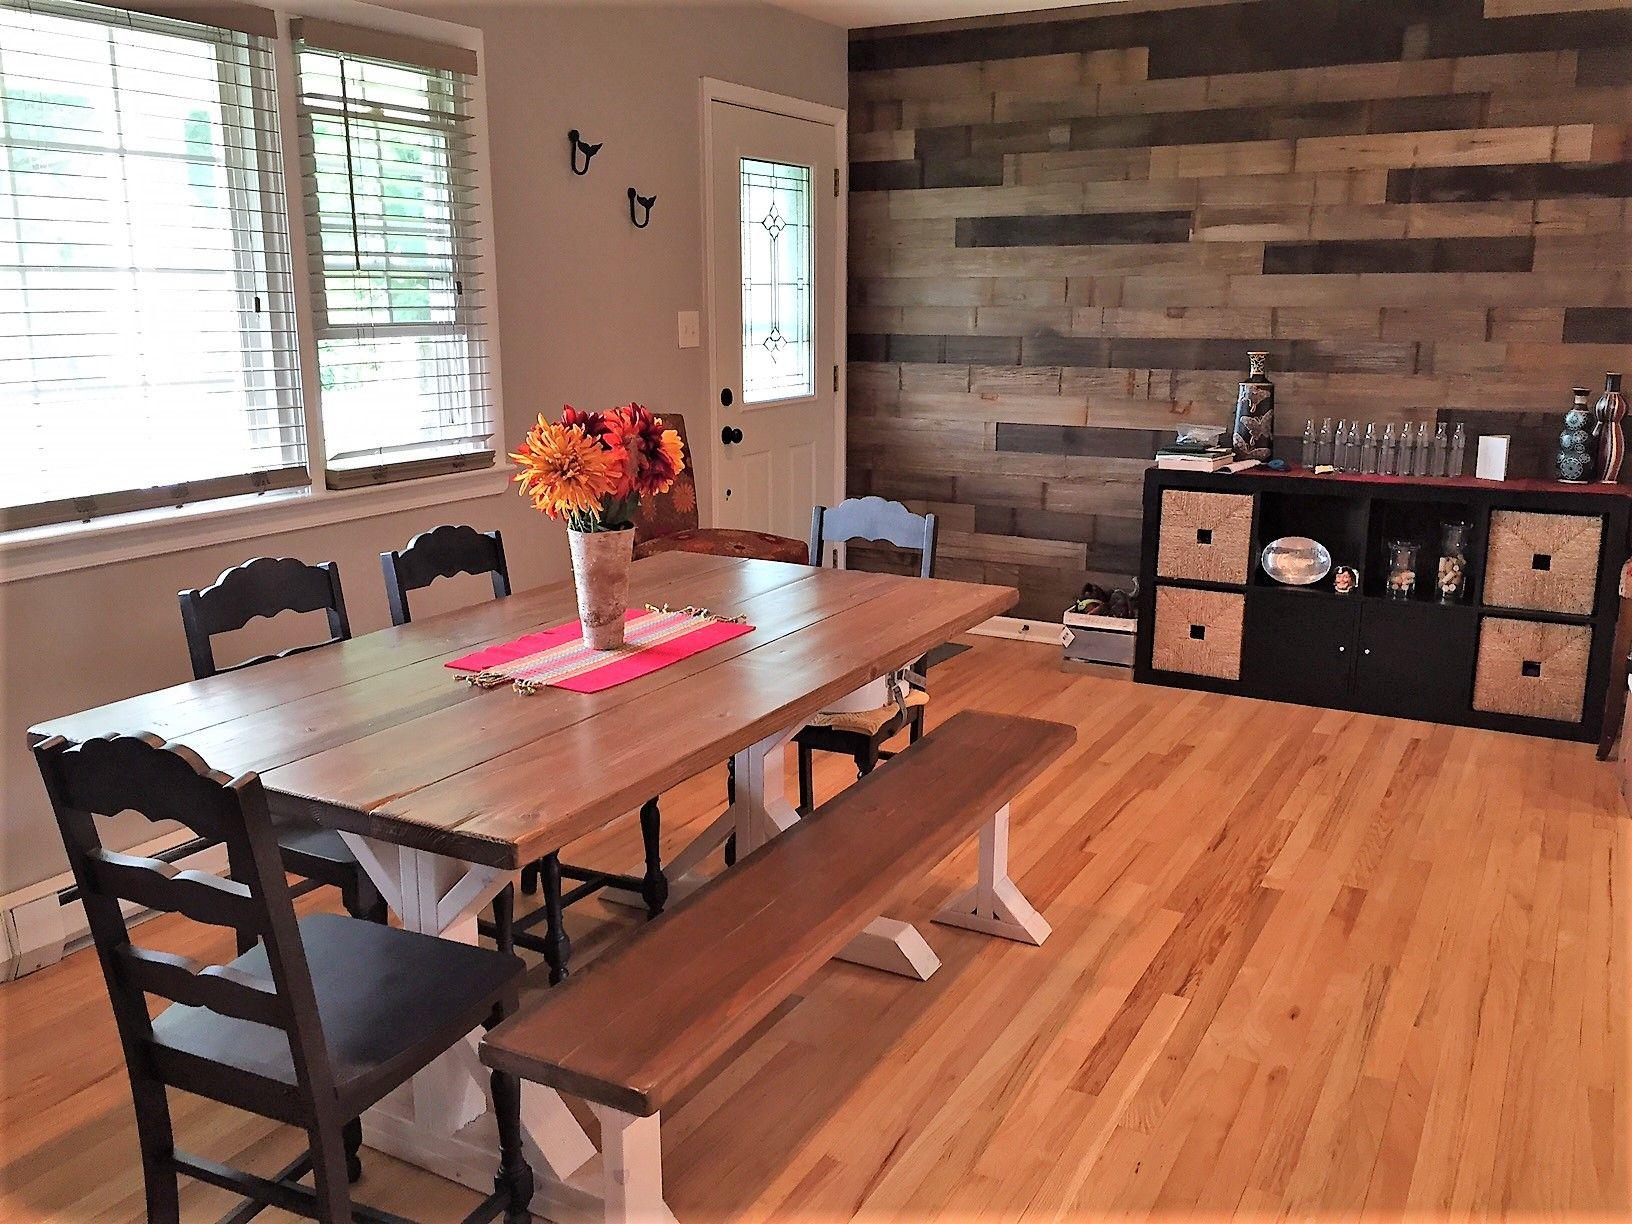 Buy a Hand Made Rustic Farmhouse Farm Trestle Dining Table ...